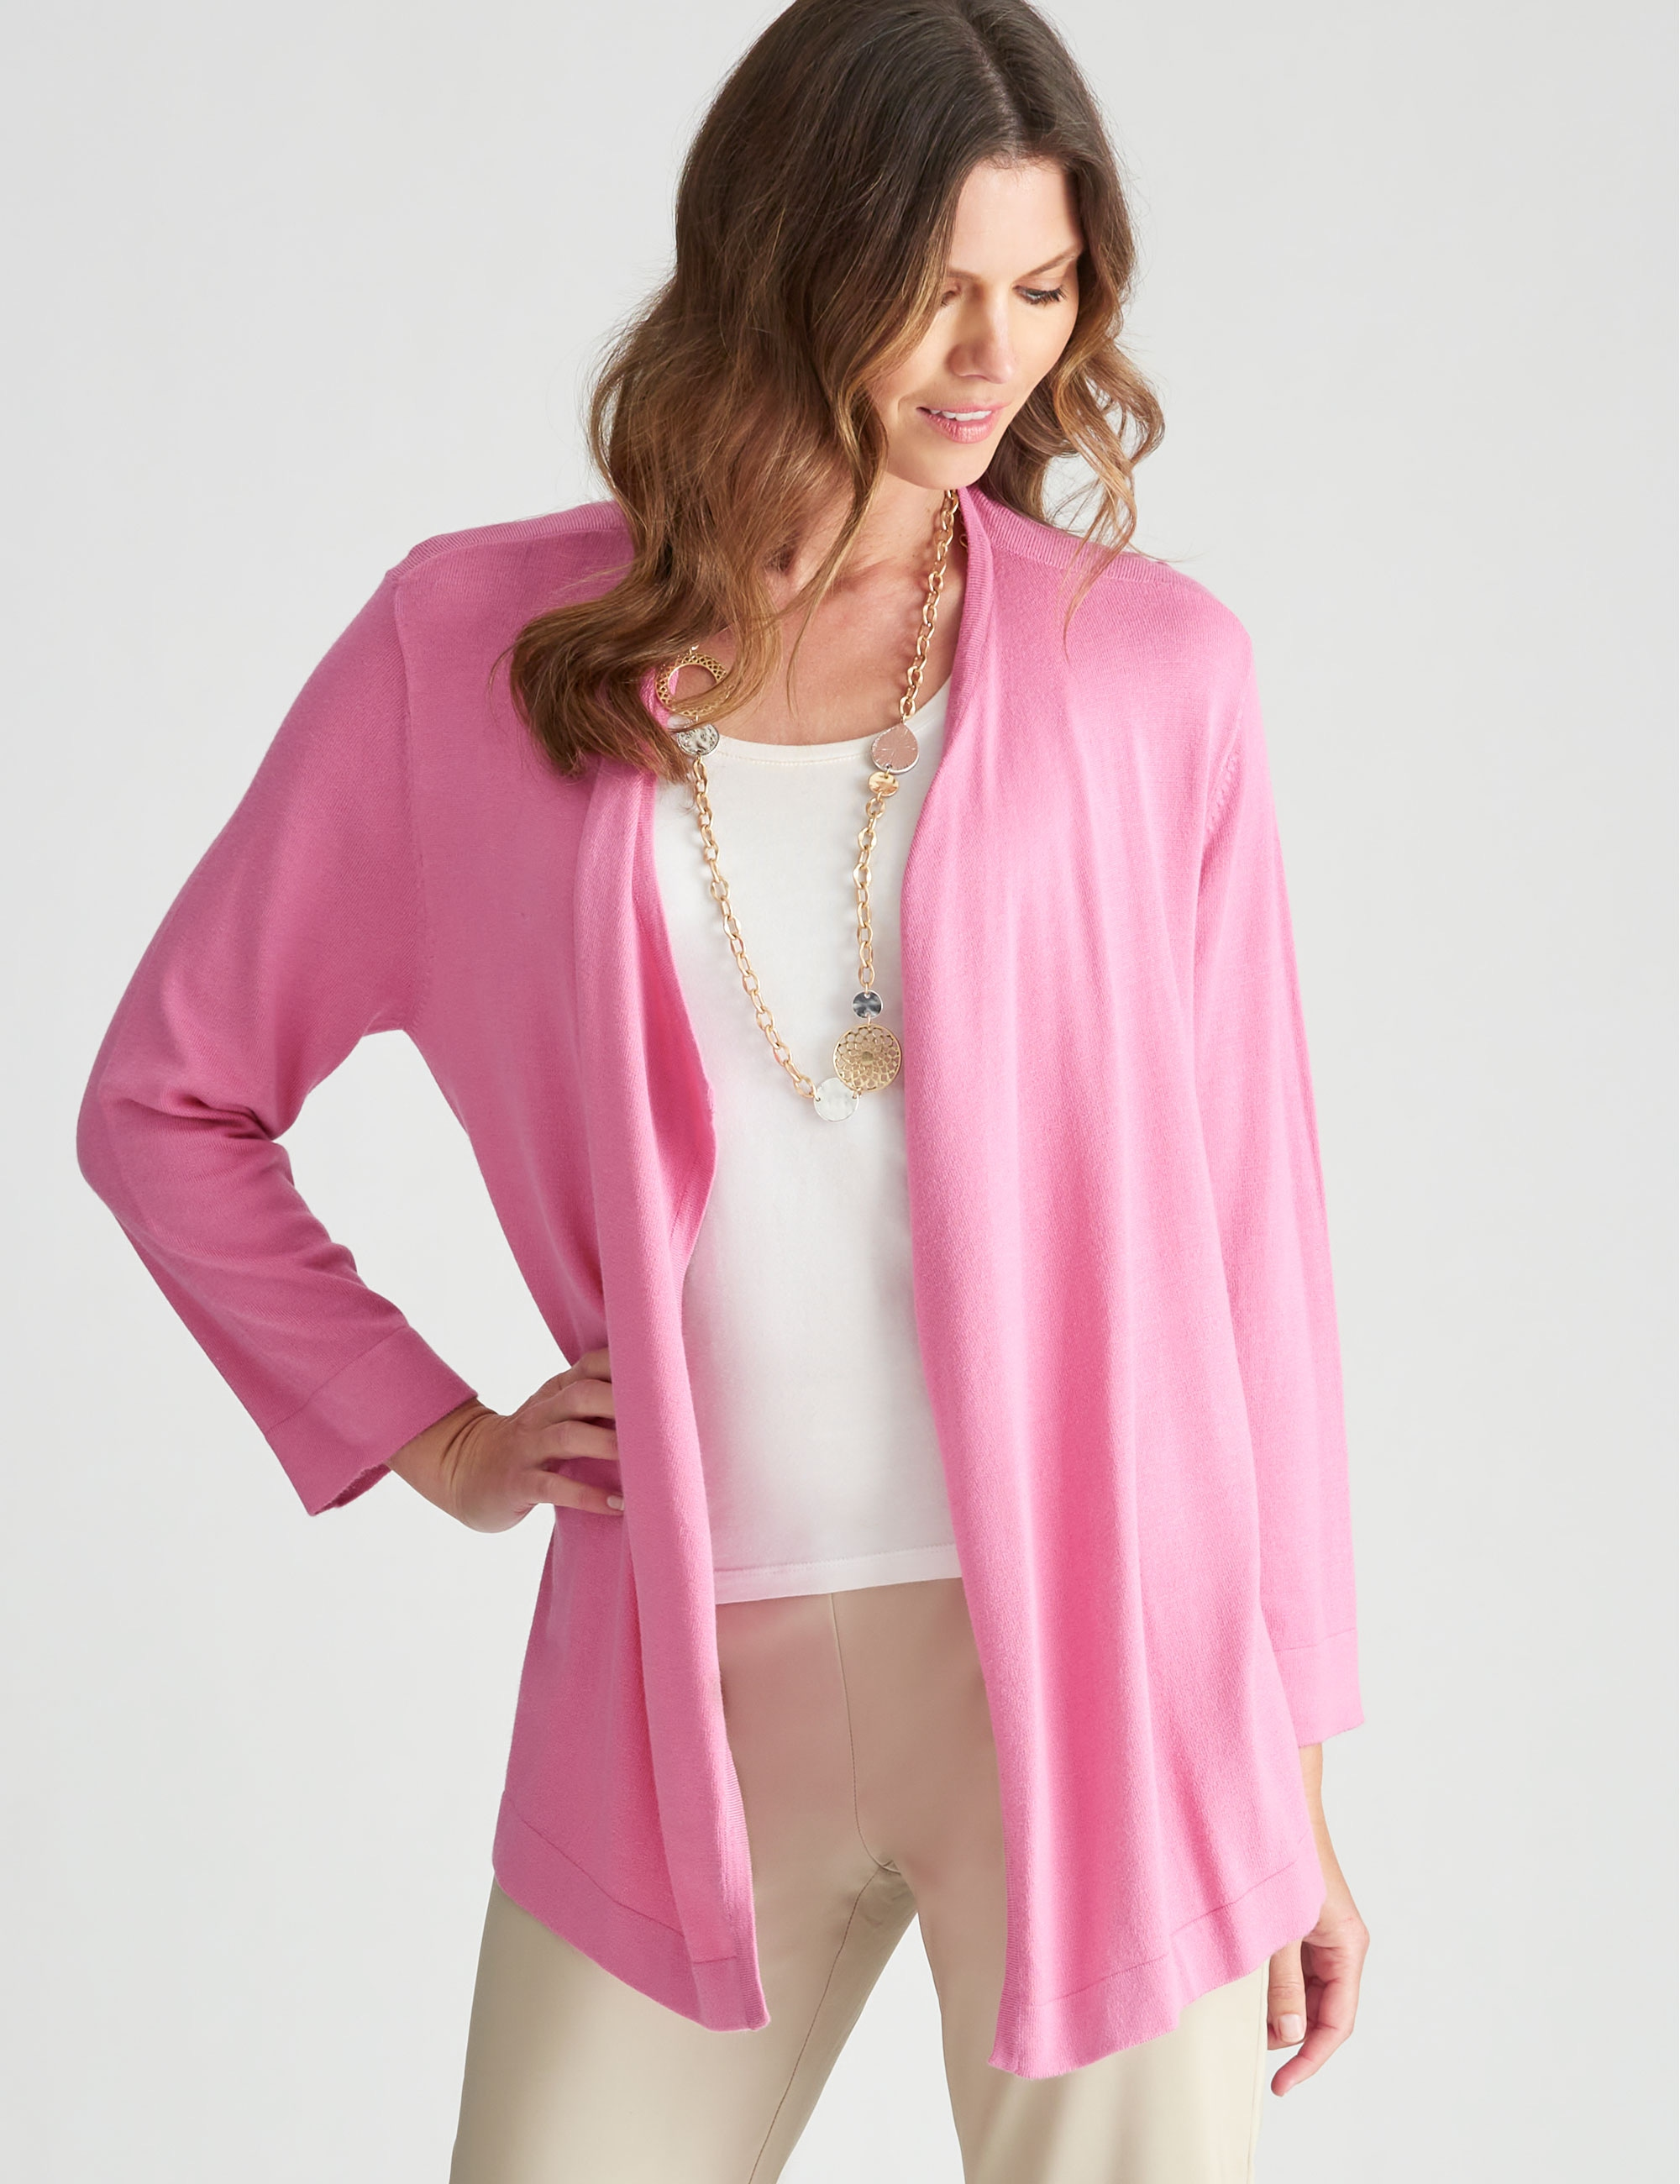 1056104630 1 - Women Fashion